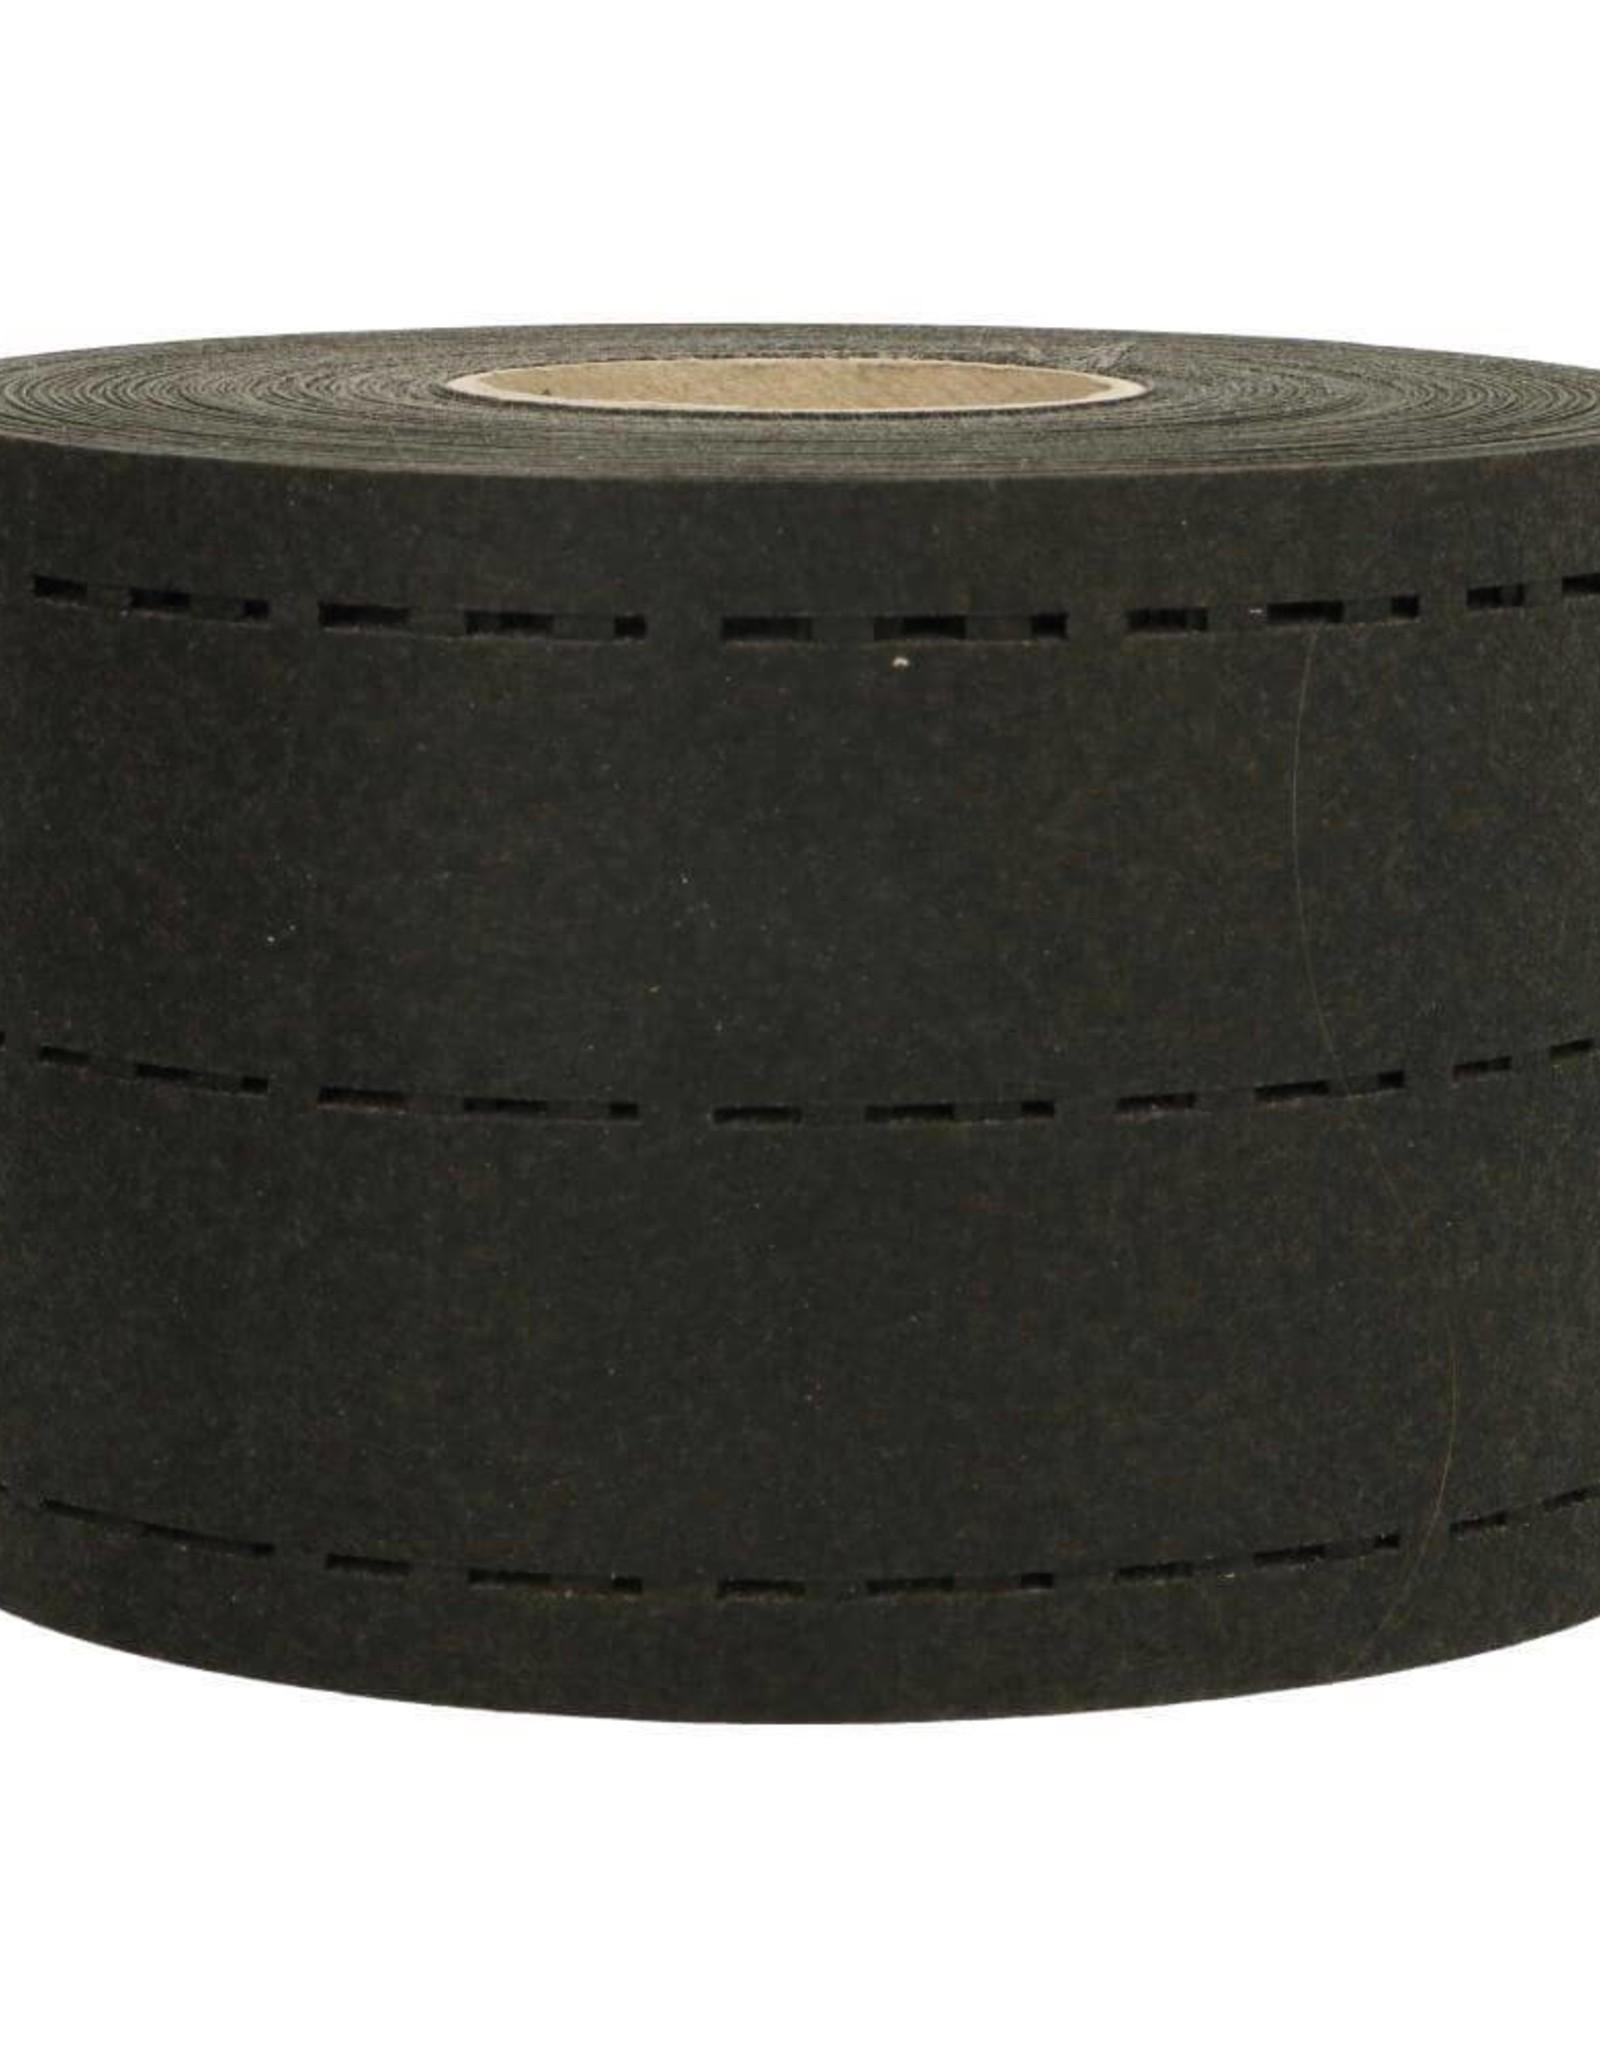 Vlieseline Tailleband versteviging - Zwart - 35mm